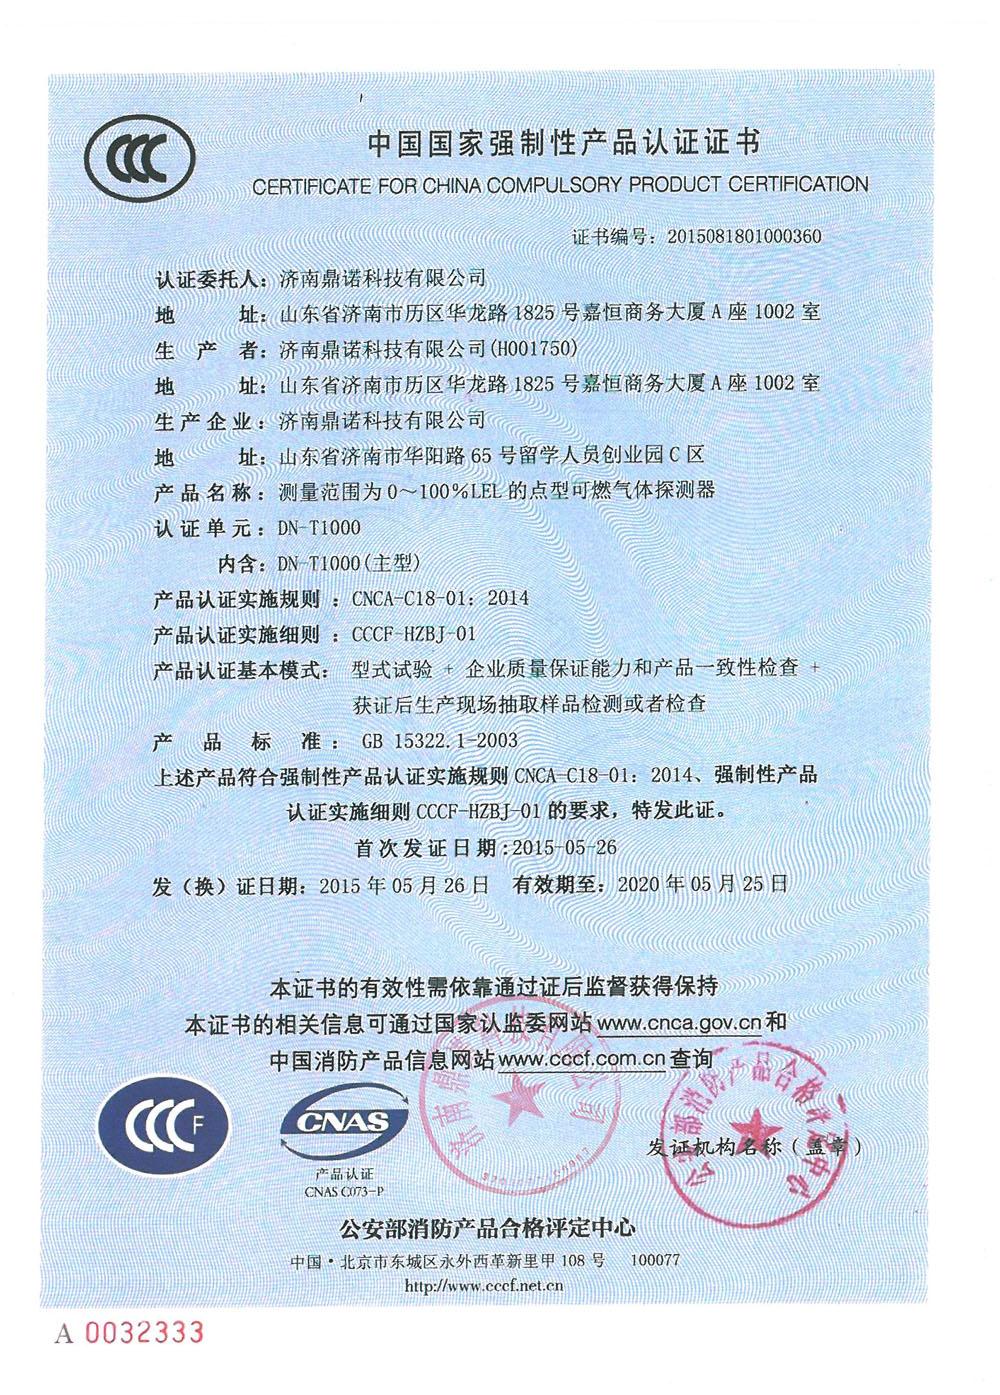 DN-T1000型強制產品認證證書